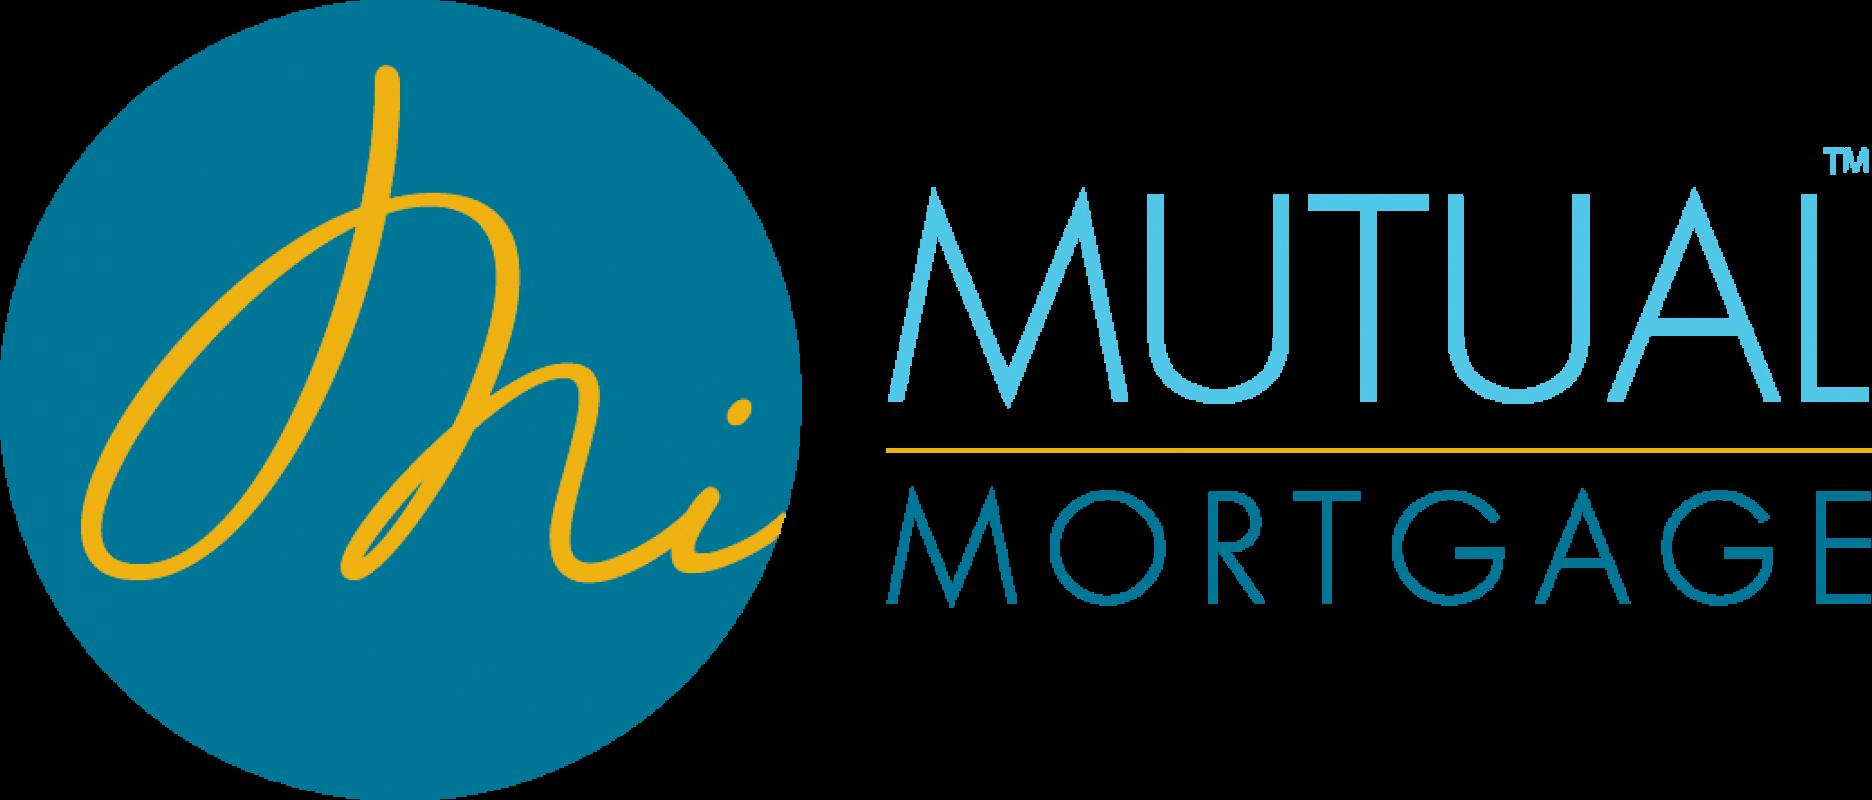 MiMutual Mortgage | Home Loans